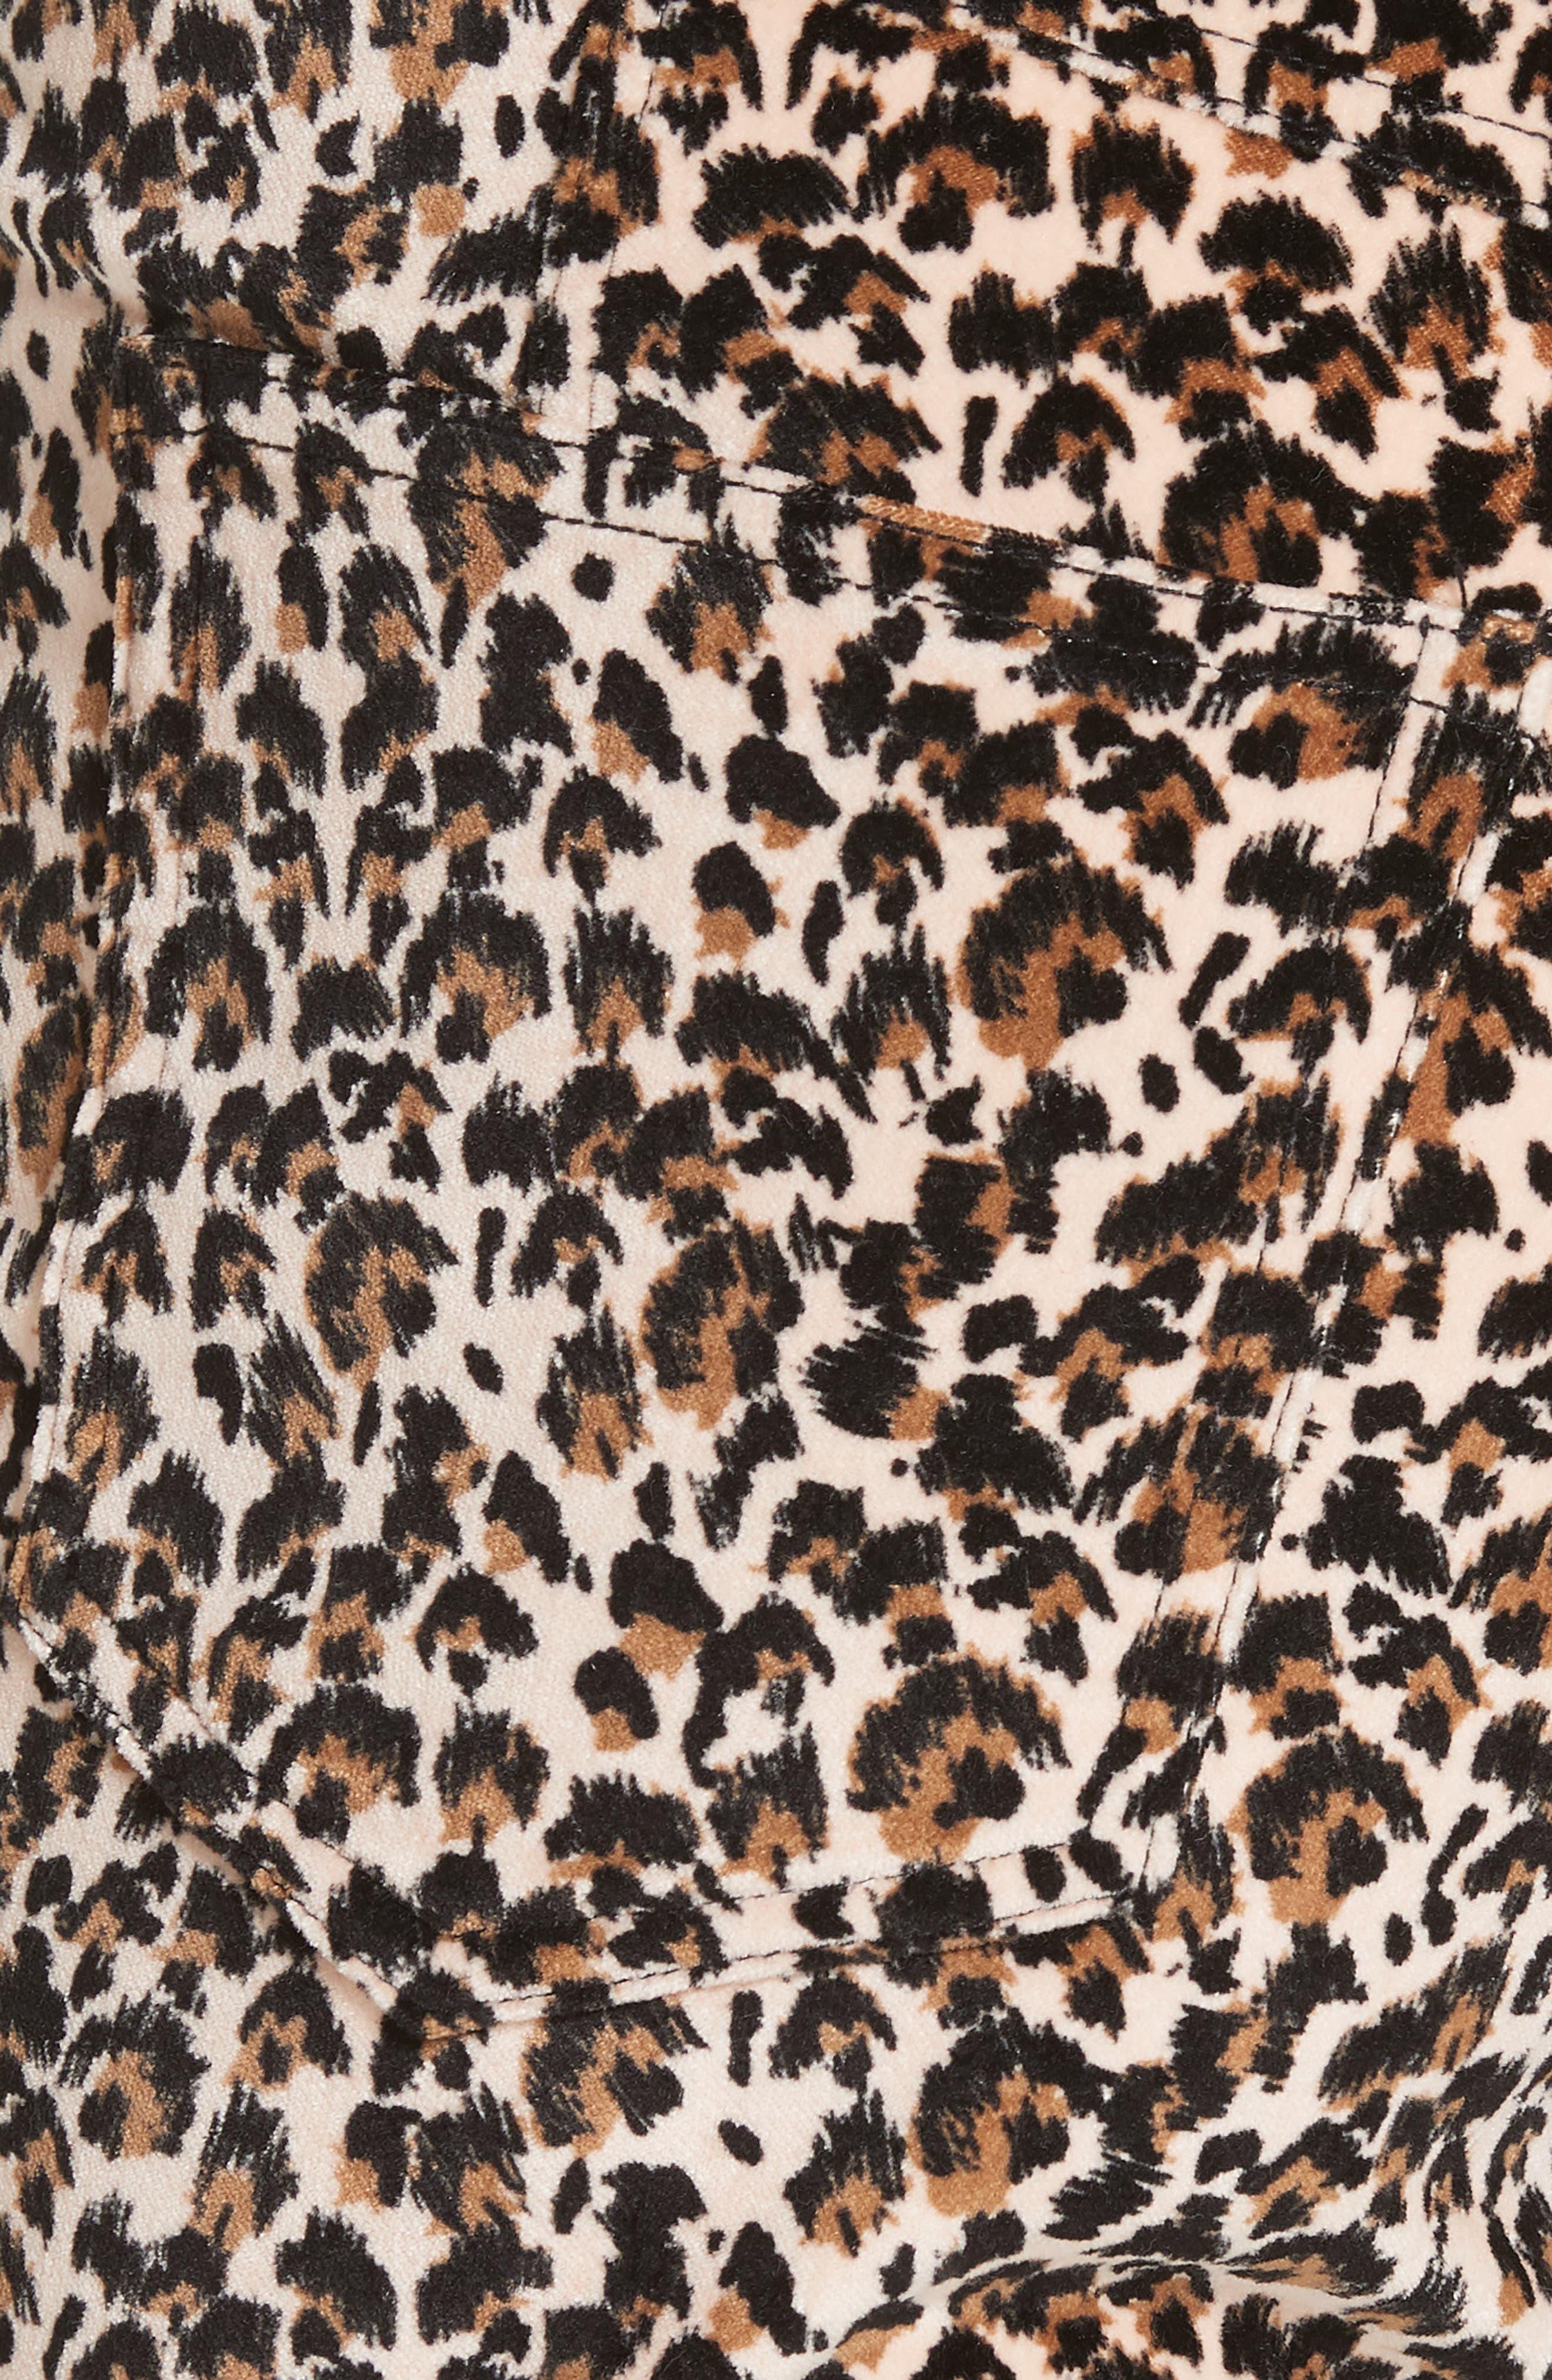 Leopard Print Stretch Velvet Pants,                             Alternate thumbnail 5, color,                             250